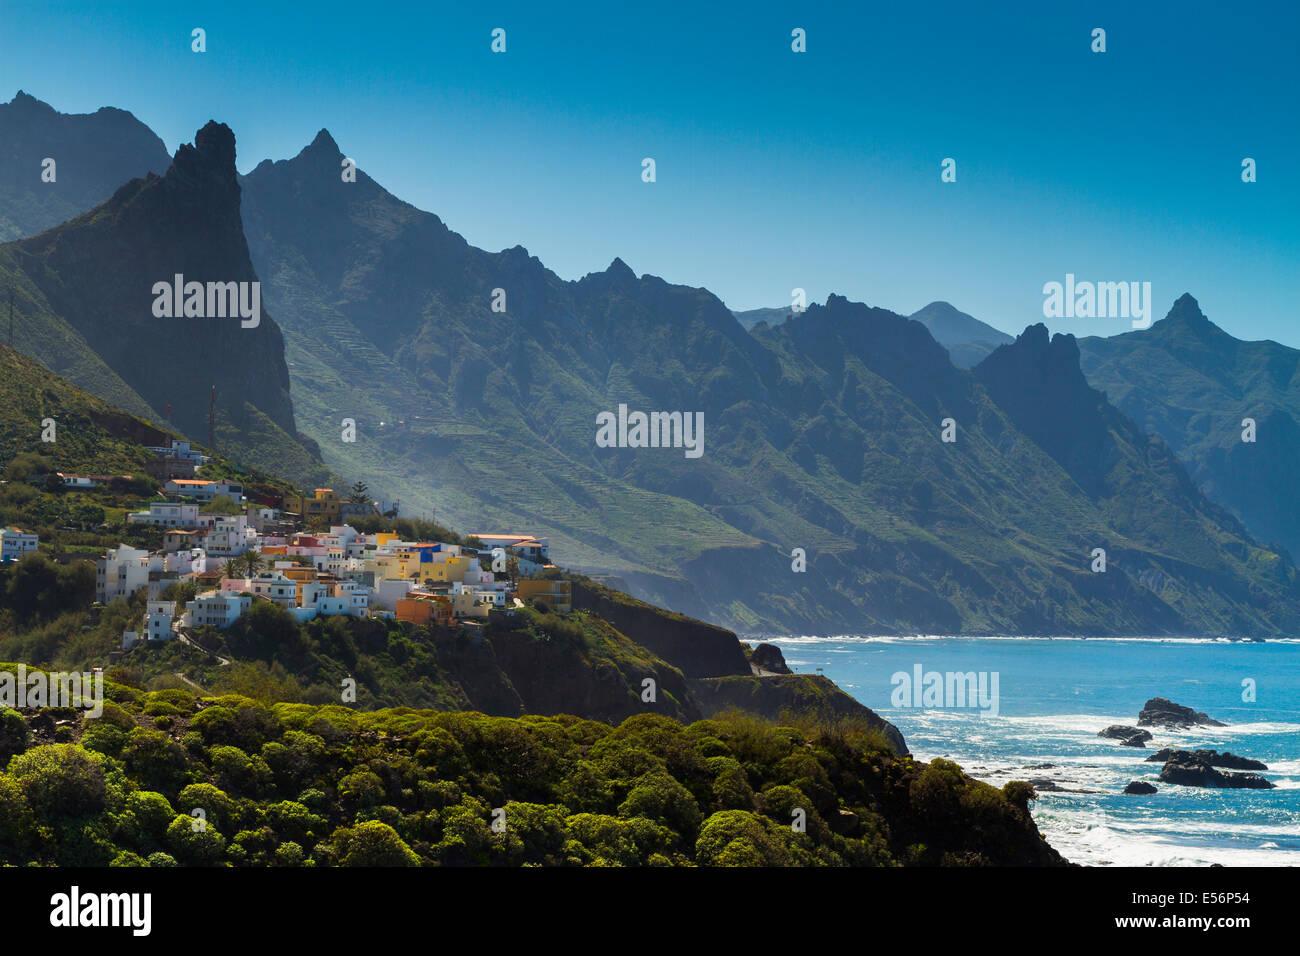 Taganaga village and cliffs. Santa Cruz de Tenerife, Tenerife, Canary Islands, Atlantic Ocean, Spain. - Stock Image